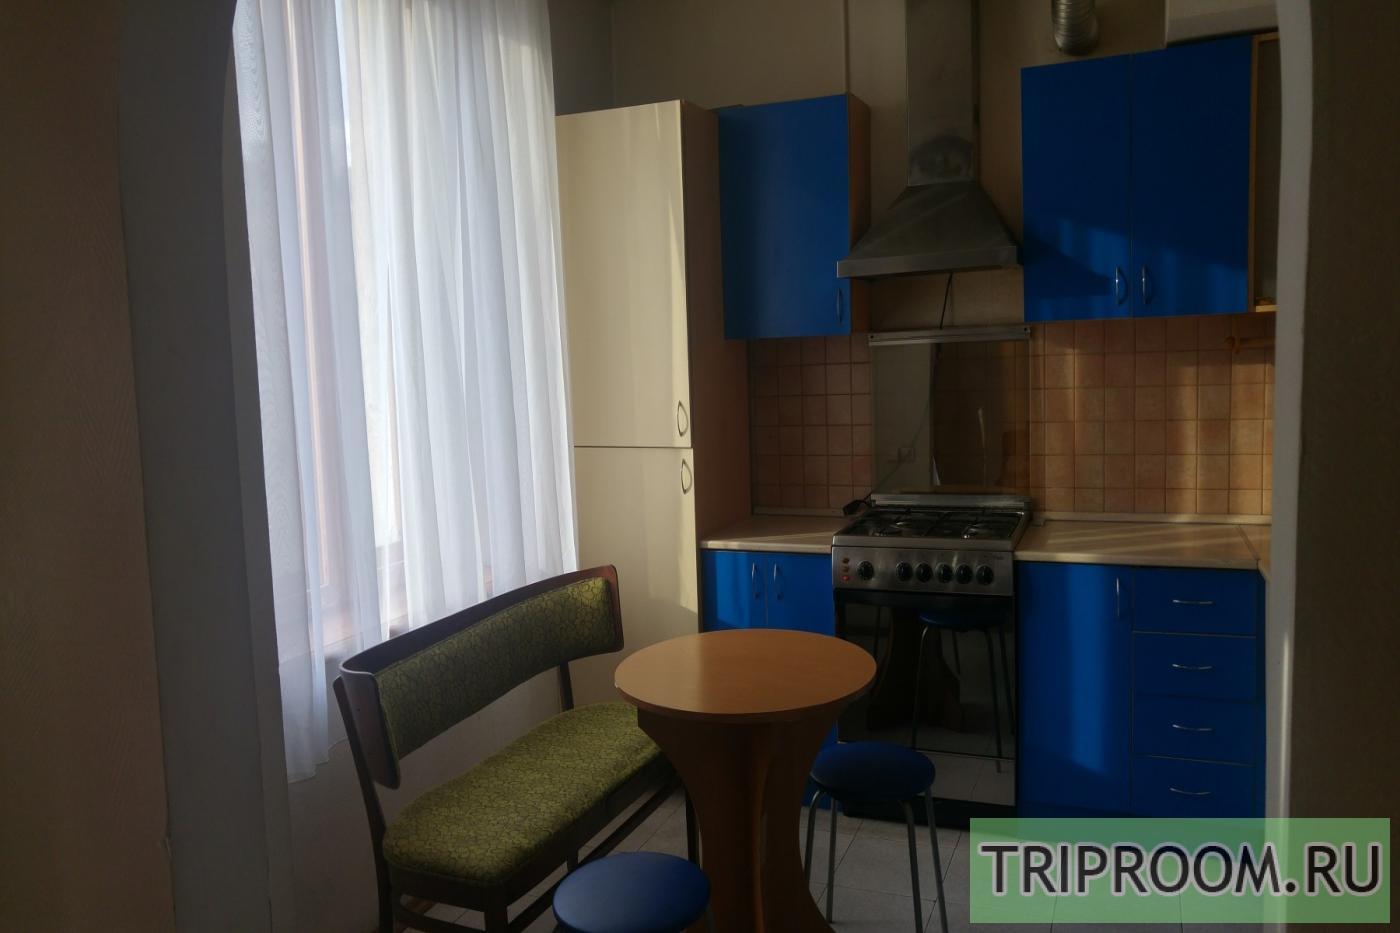 2-комнатная квартира посуточно (вариант № 18696), ул. Мира улица, фото № 3